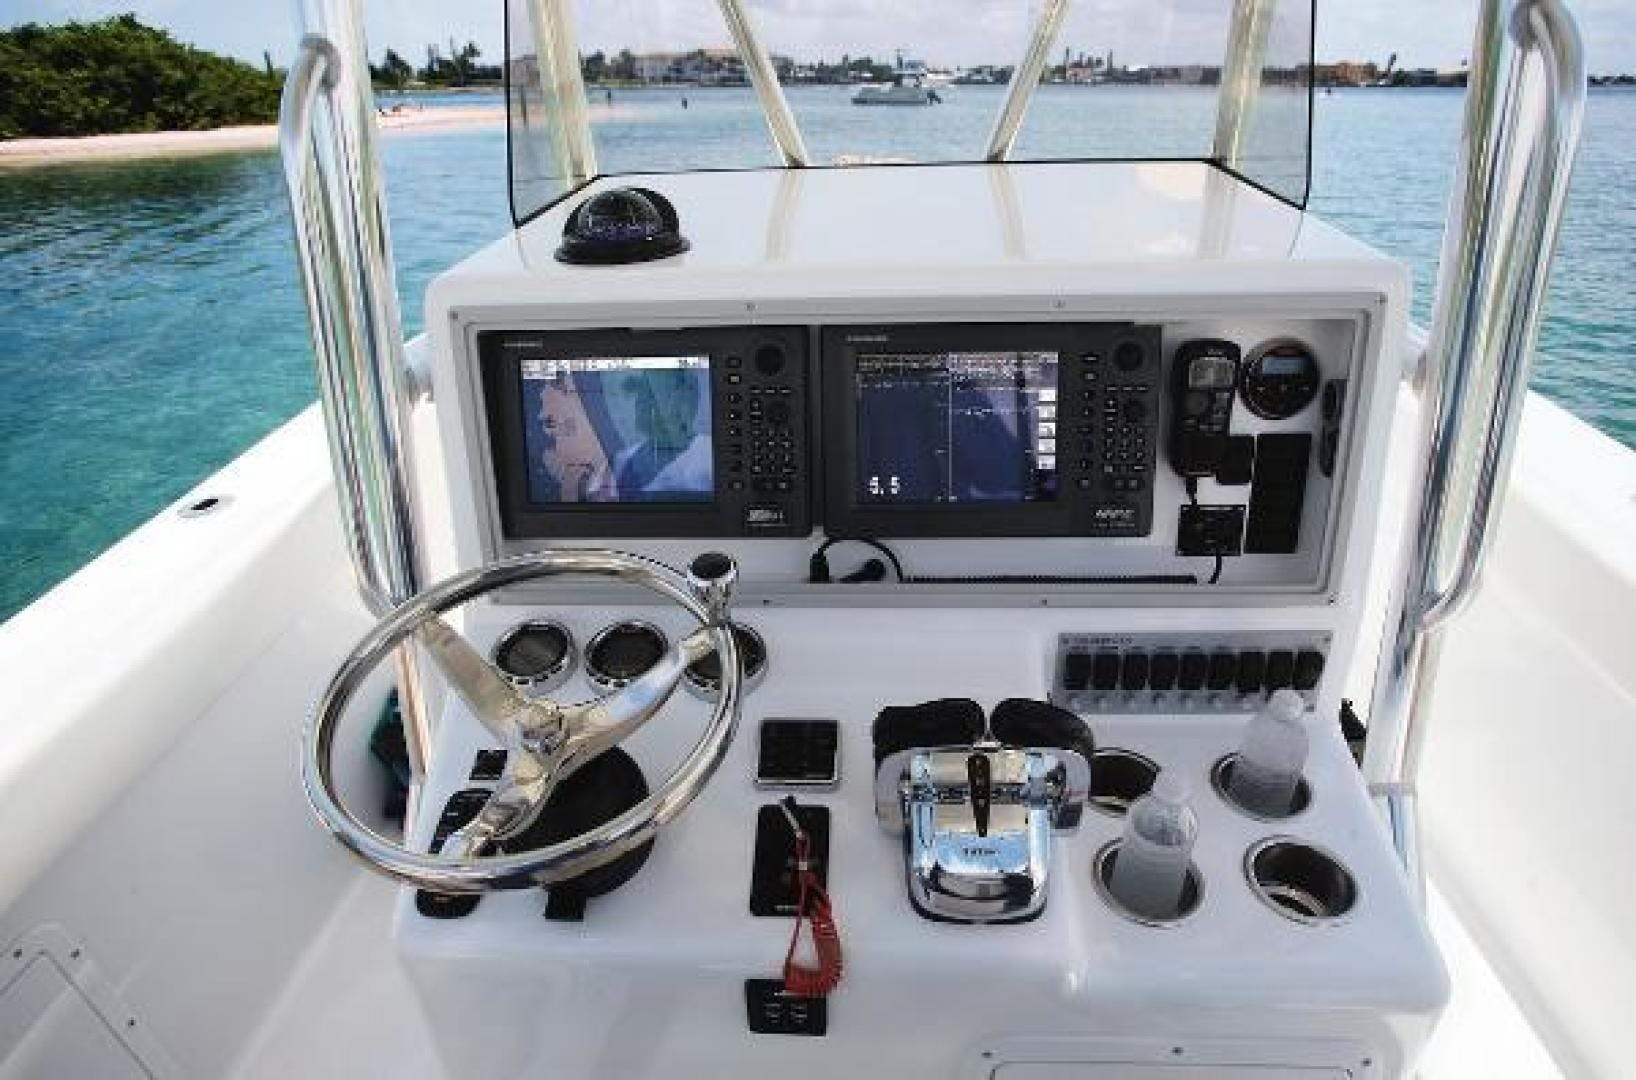 2020 Bluewater Sportfishing 27' 2850 Bluewater Sportfishing 2850 | Picture 7 of 16